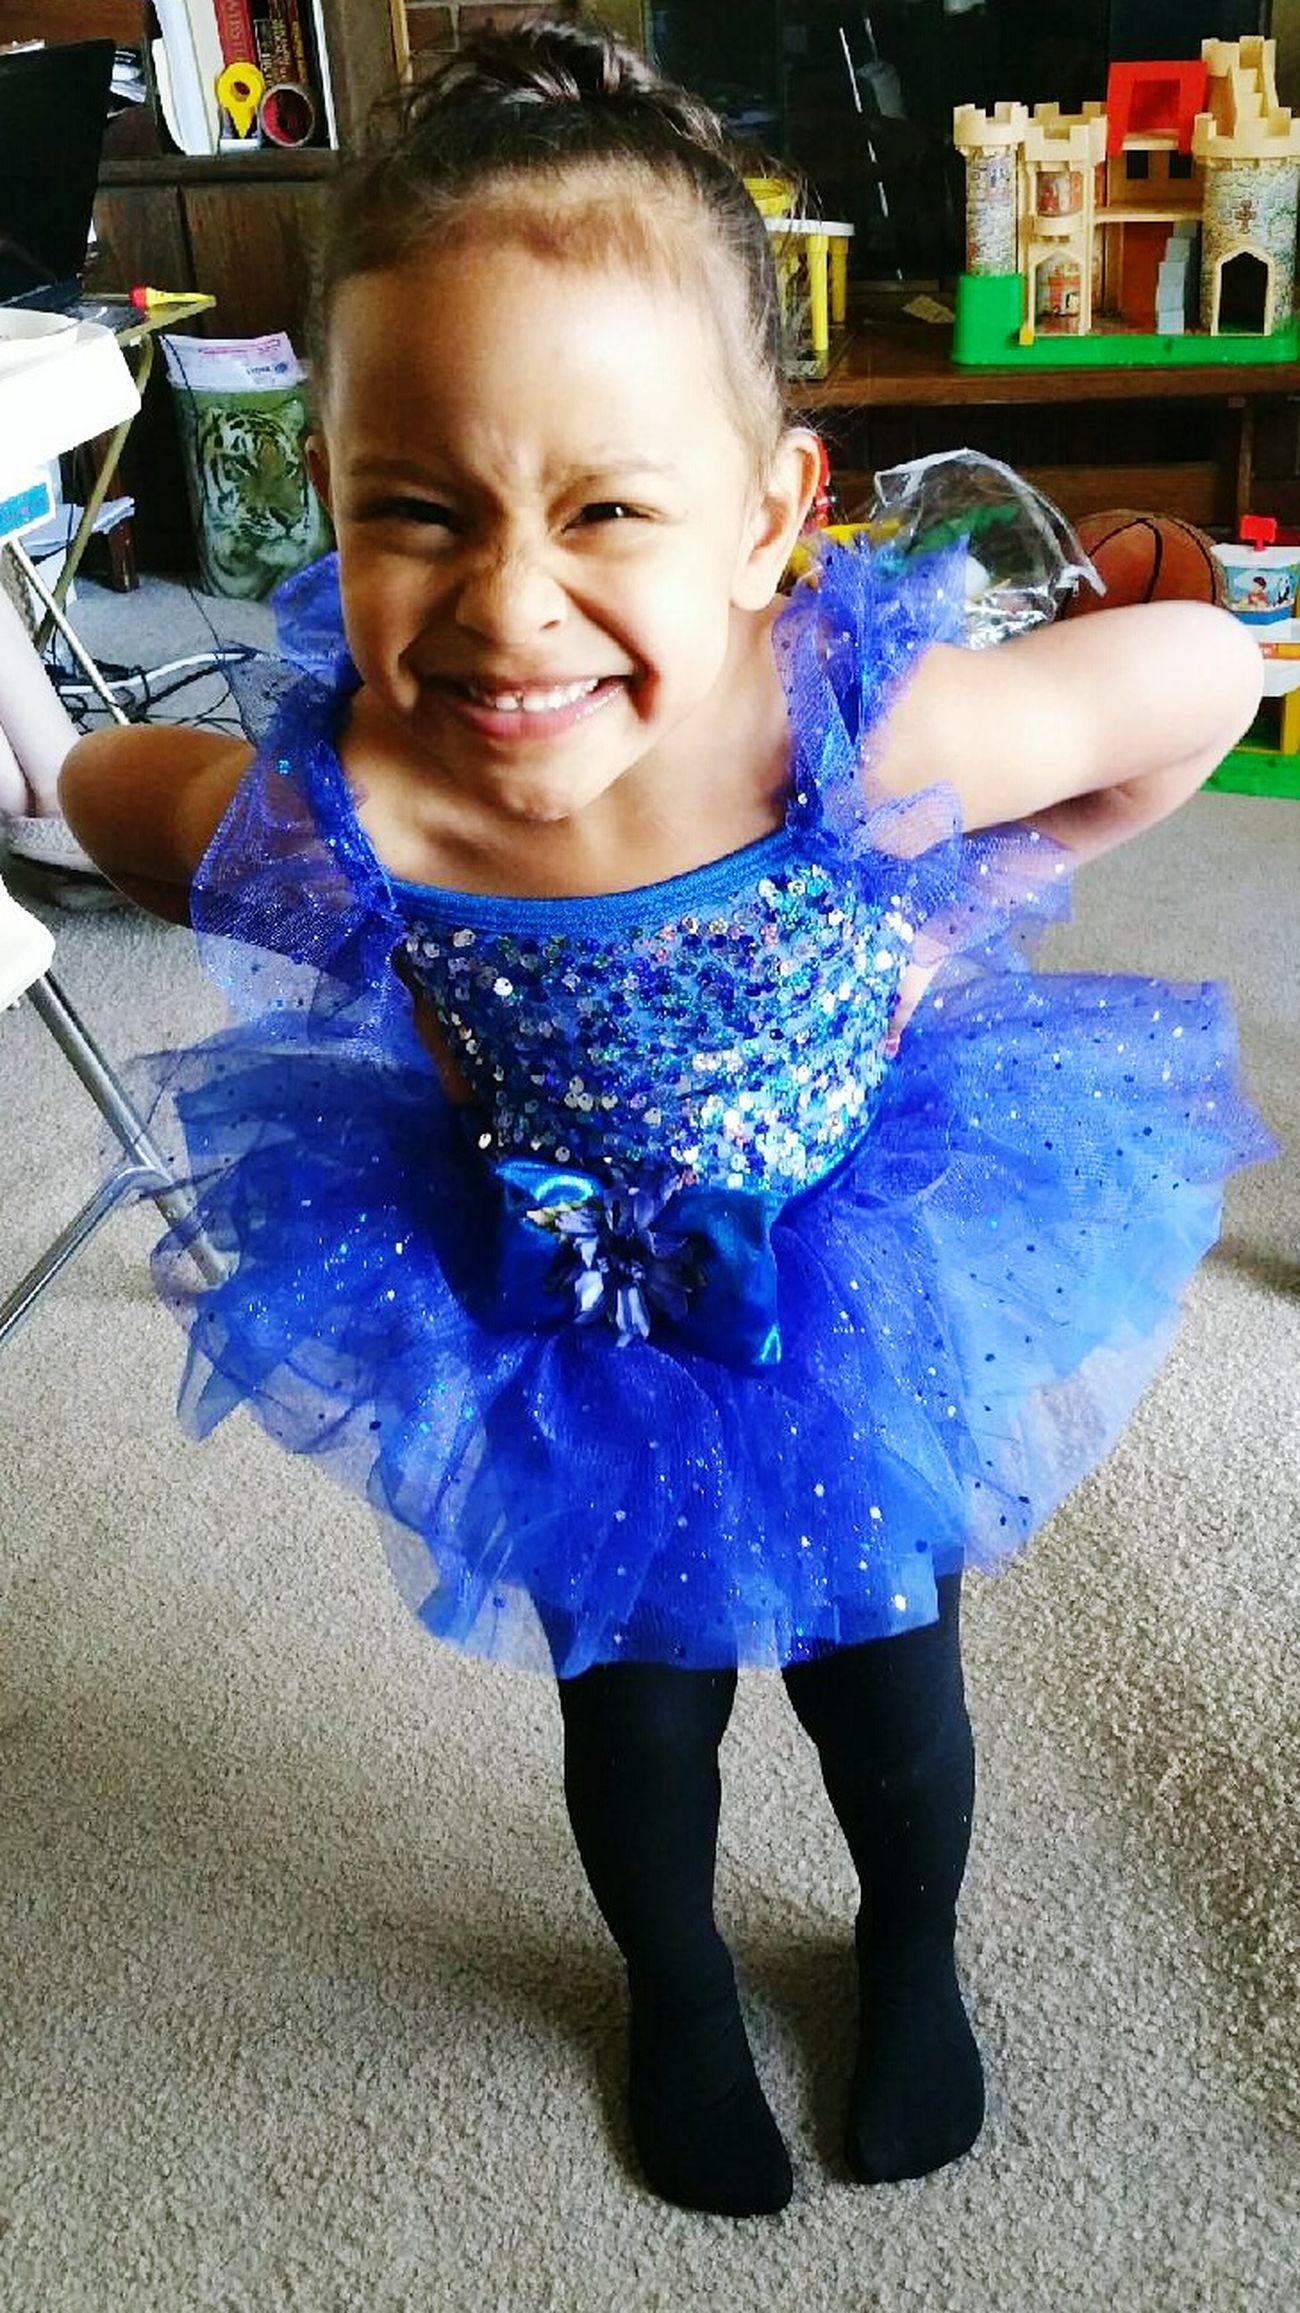 My Little Lady🐞 Mysassygirl Mylittleangel Pretty Girl Cuteness Overload!! Grandmasbabygirl Adorableness Cute Baby Princess👸 Littleballerina